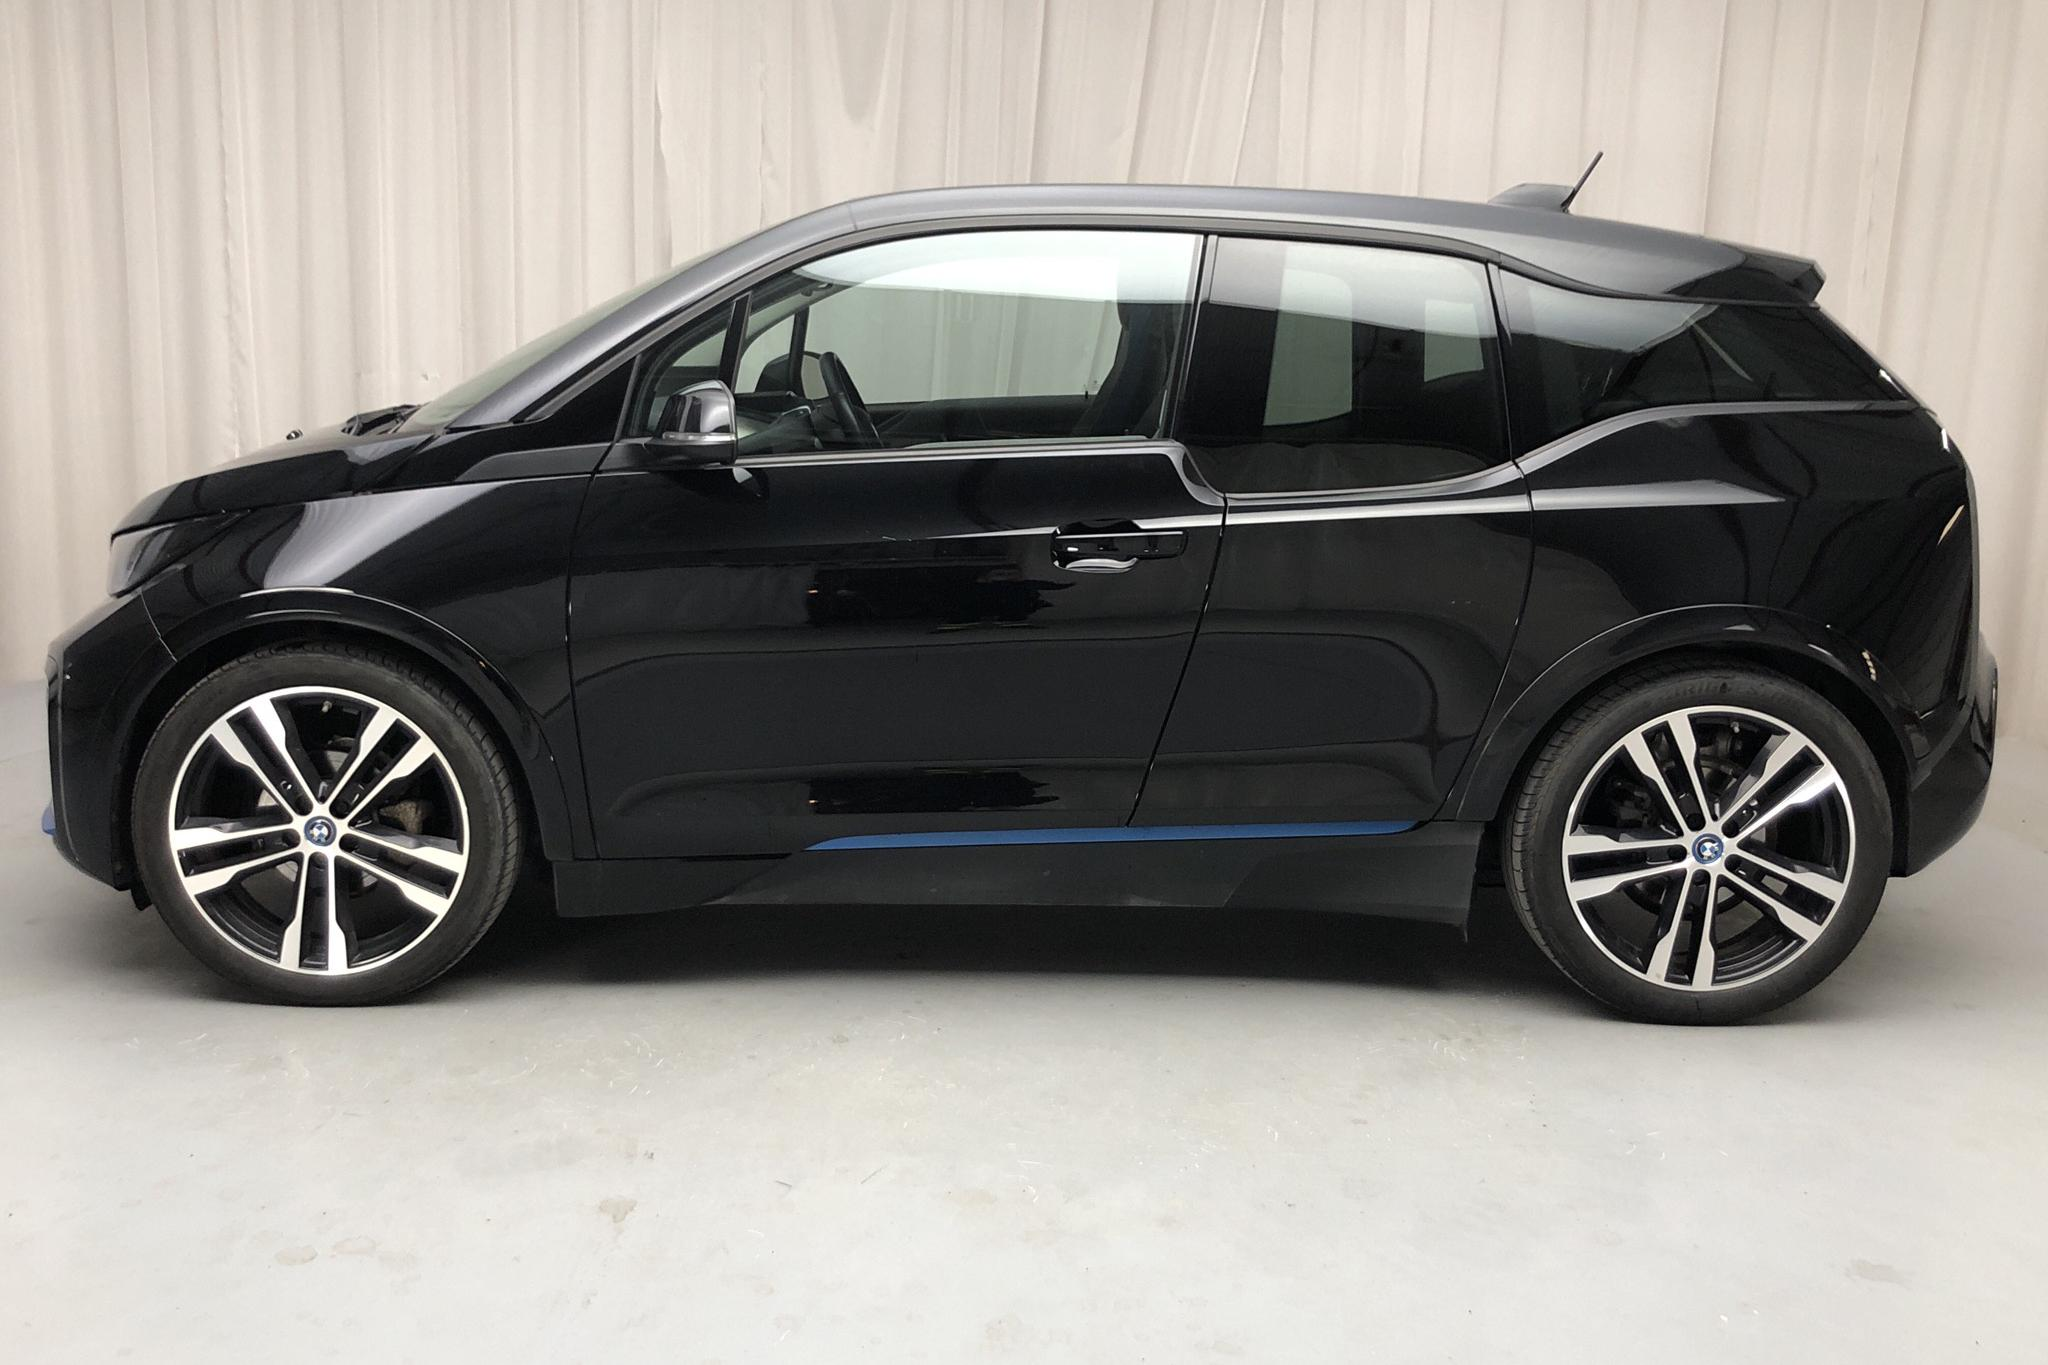 BMW i3s 120Ah, I01 (184hk) - 3 842 mil - Automat - svart - 2019